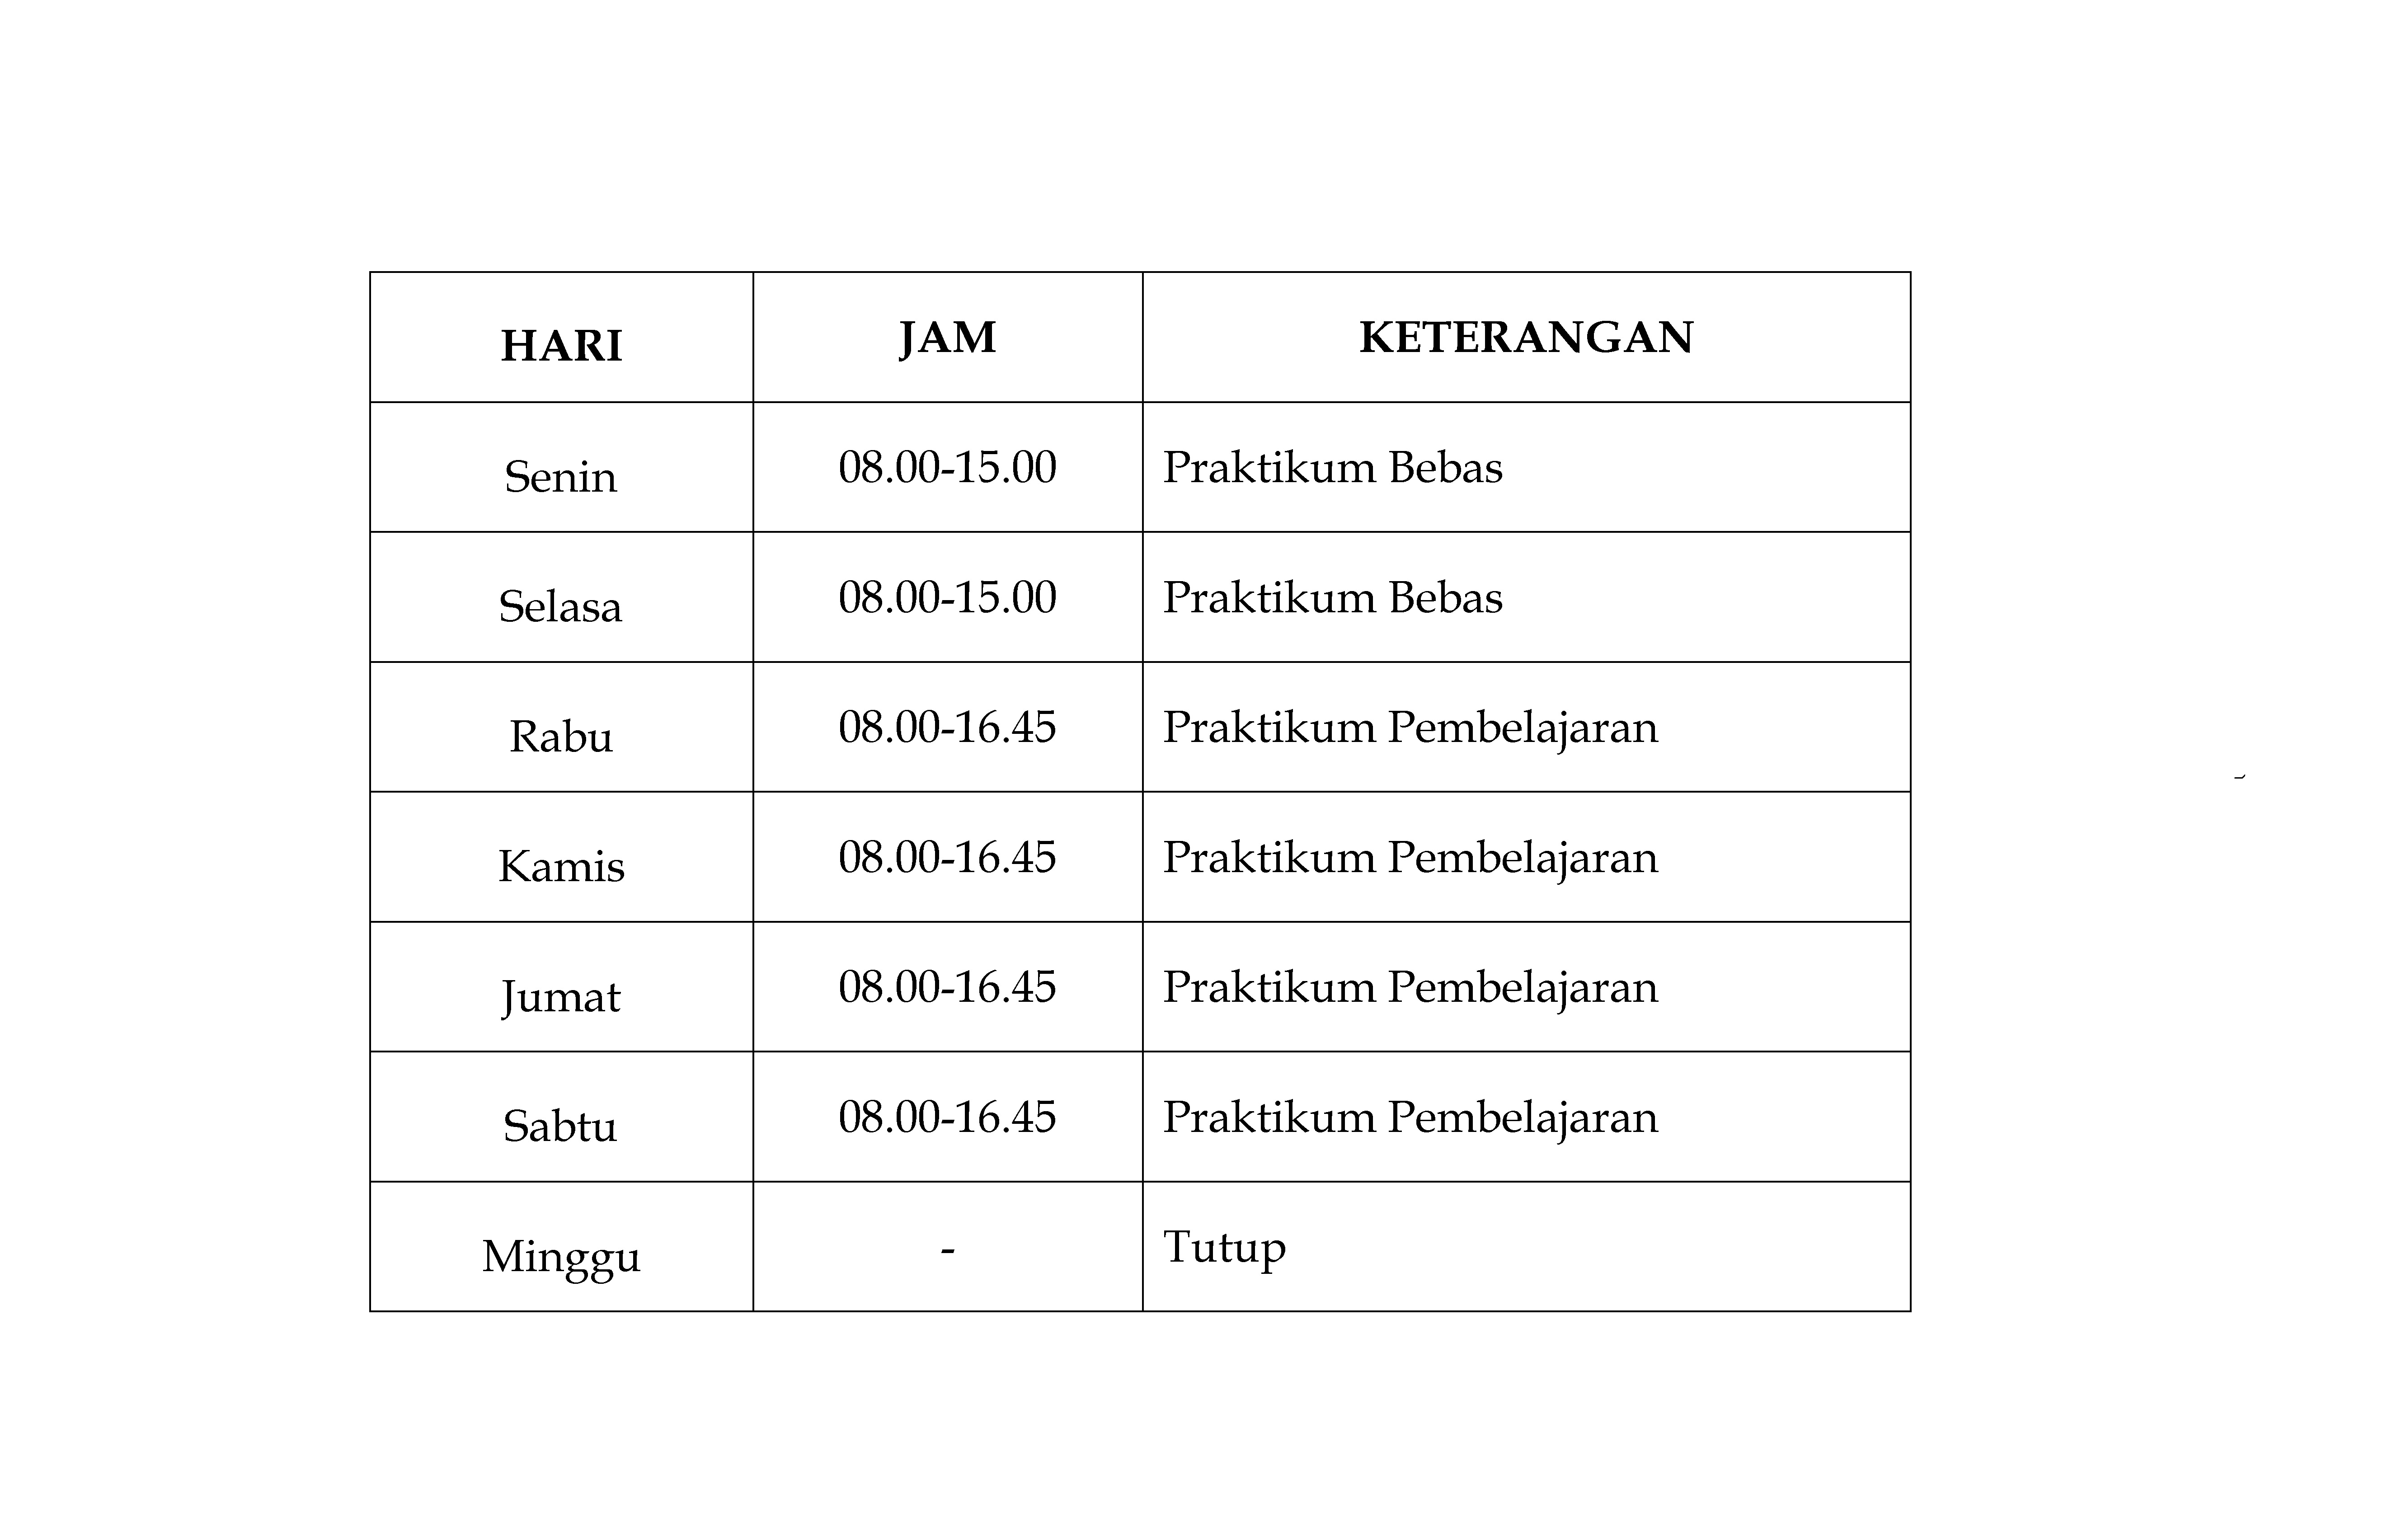 HARI  JAM KETERANGAN Senin    08.00-15.00 Praktikum Bebas Selasa  08.00-15.00 Praktikum Bebas Rabu    08.00-16.45 Praktikum Pembelajaran Kamis    08.00-16.45 Praktikum Pembelajaran Jumat    08.00-16.45 Praktikum Pembelajaran Sabtu    08.00-16.45 Praktikum Pembelajaran Minggu   -   Tutup